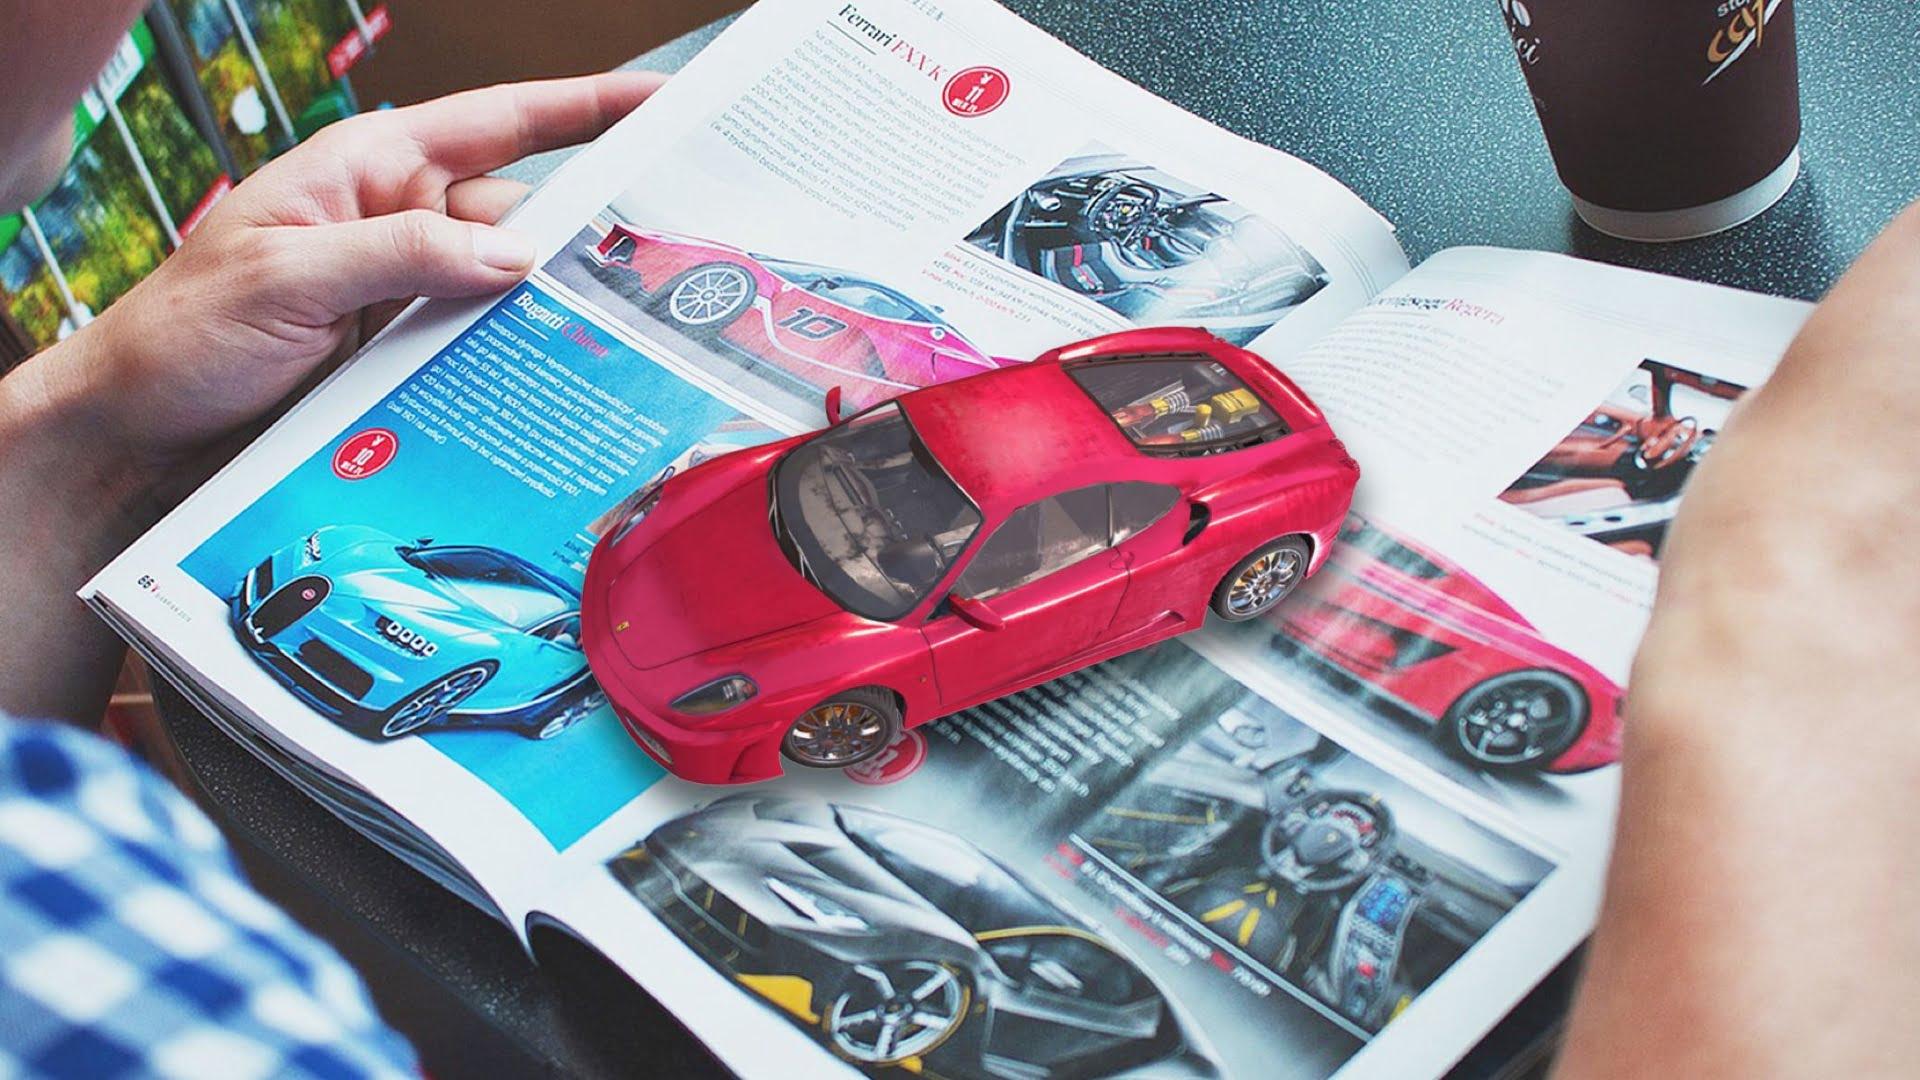 Augmented Reality print media